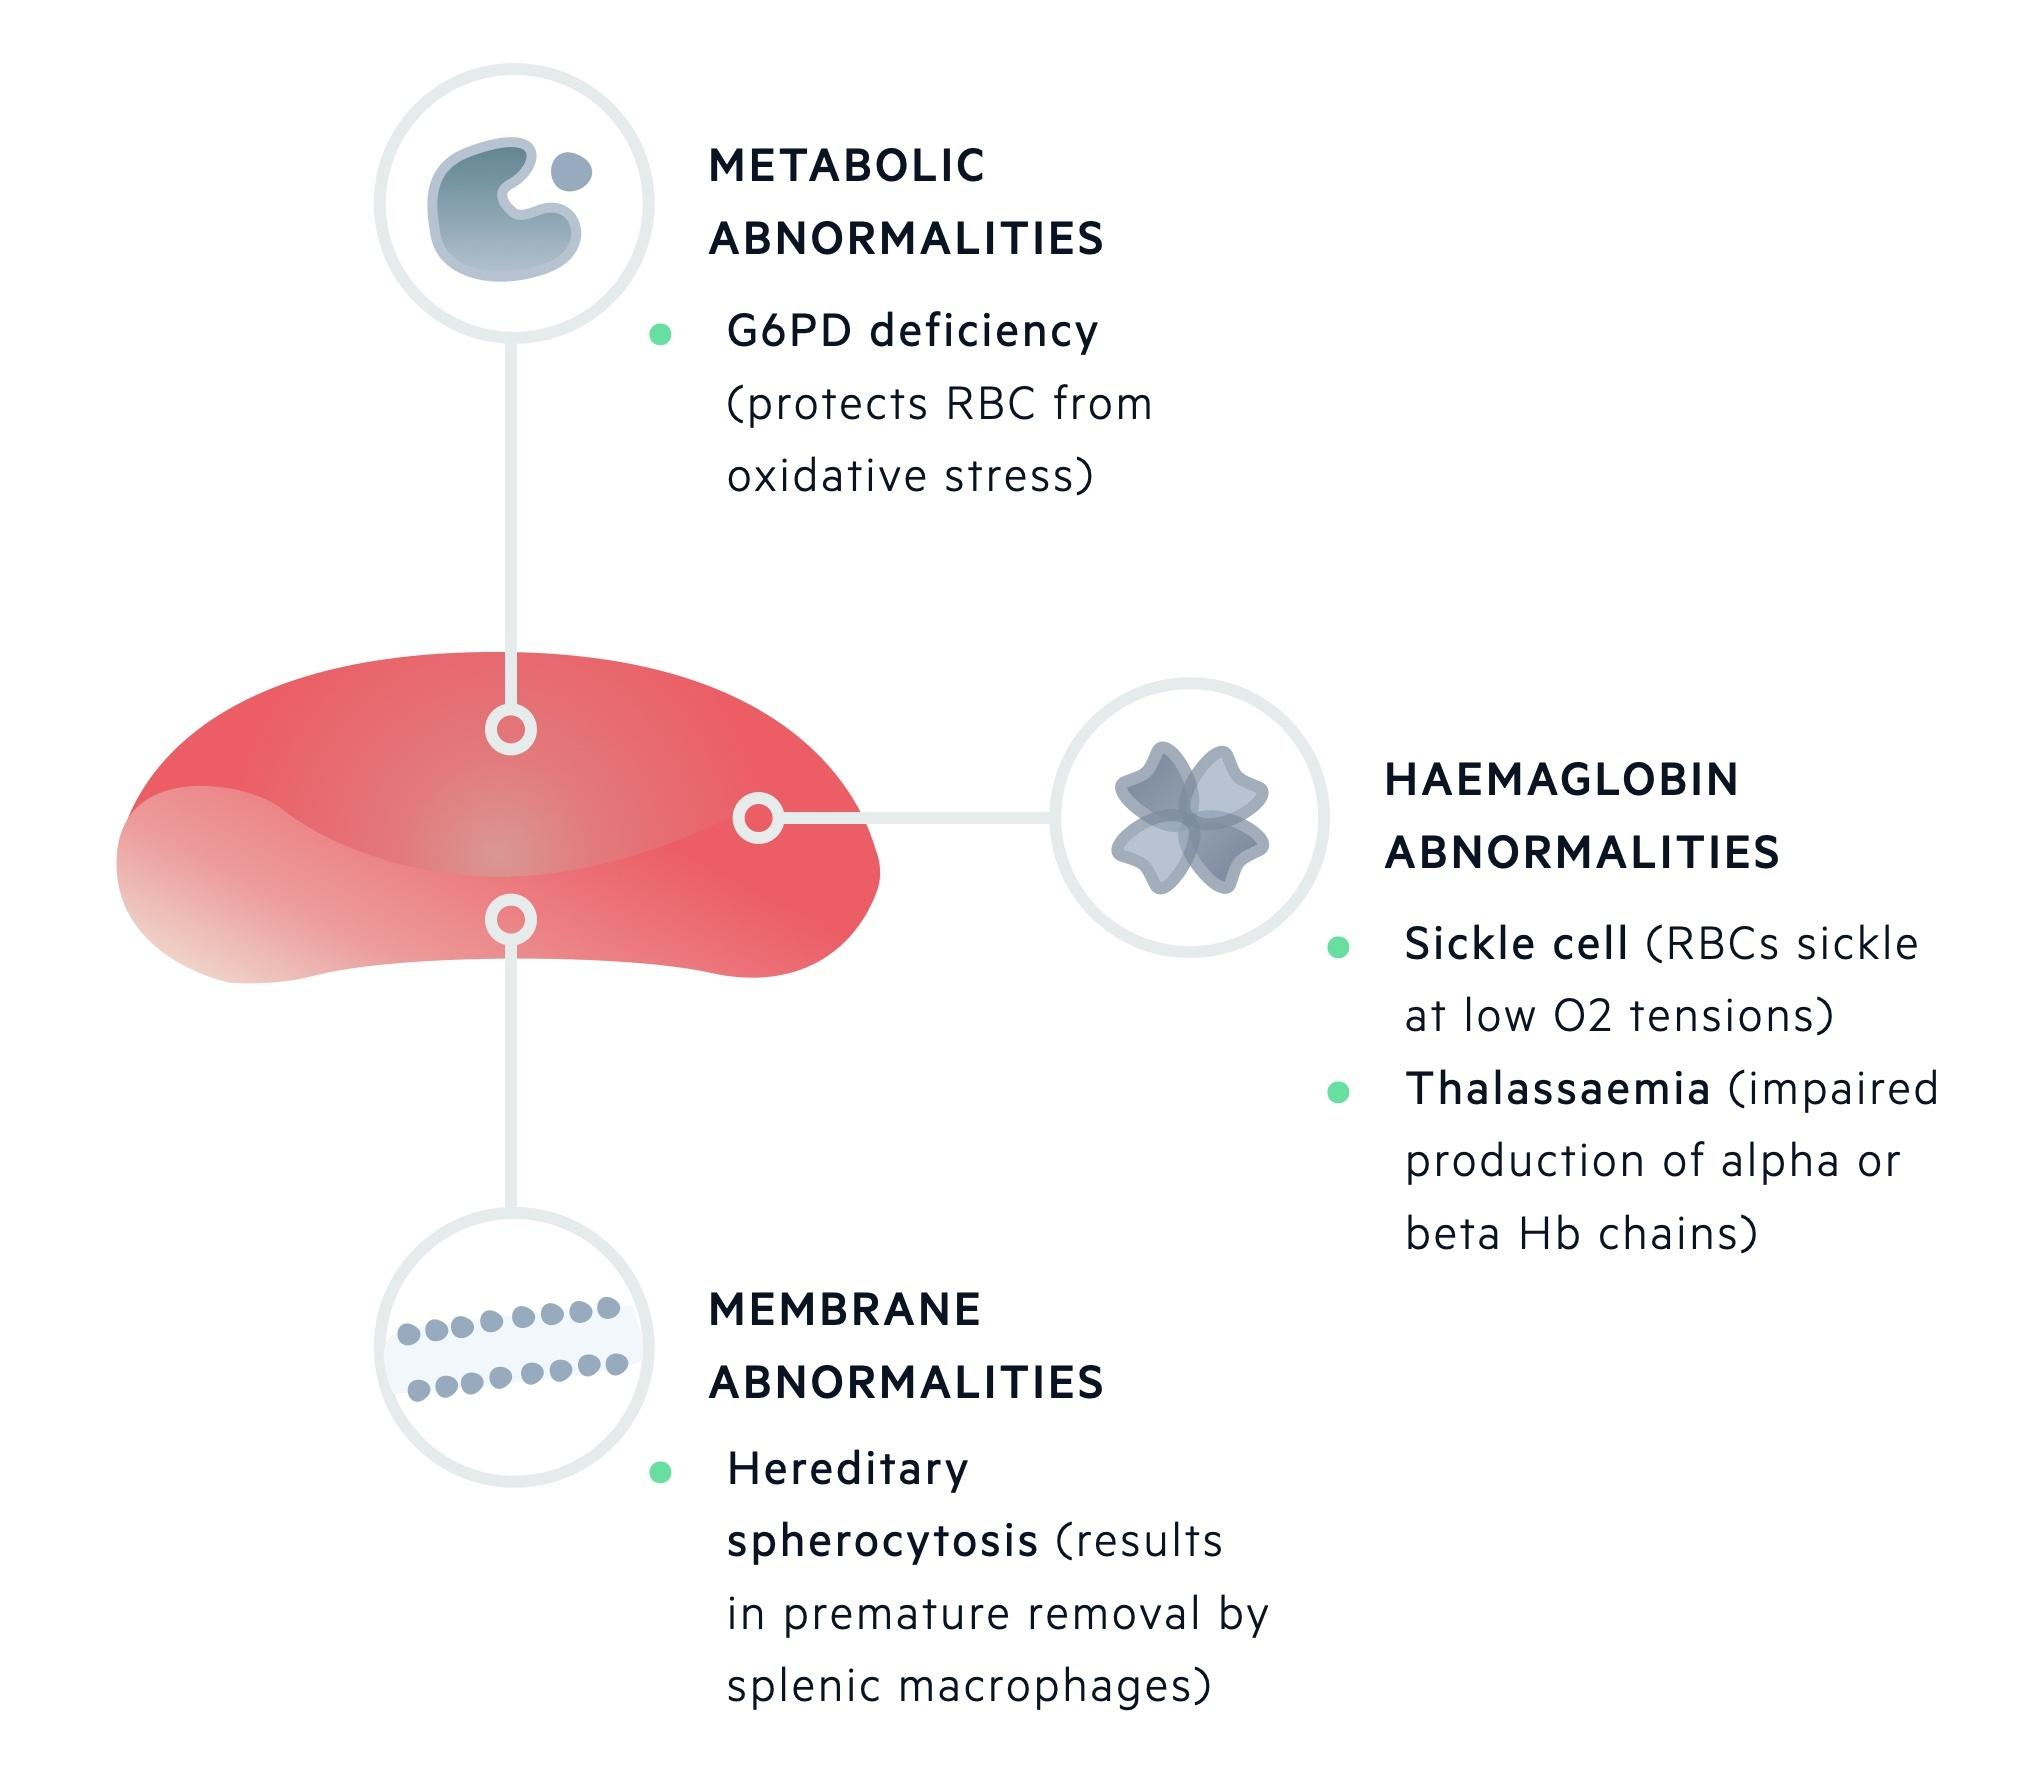 Inherited haemolytic anaemia